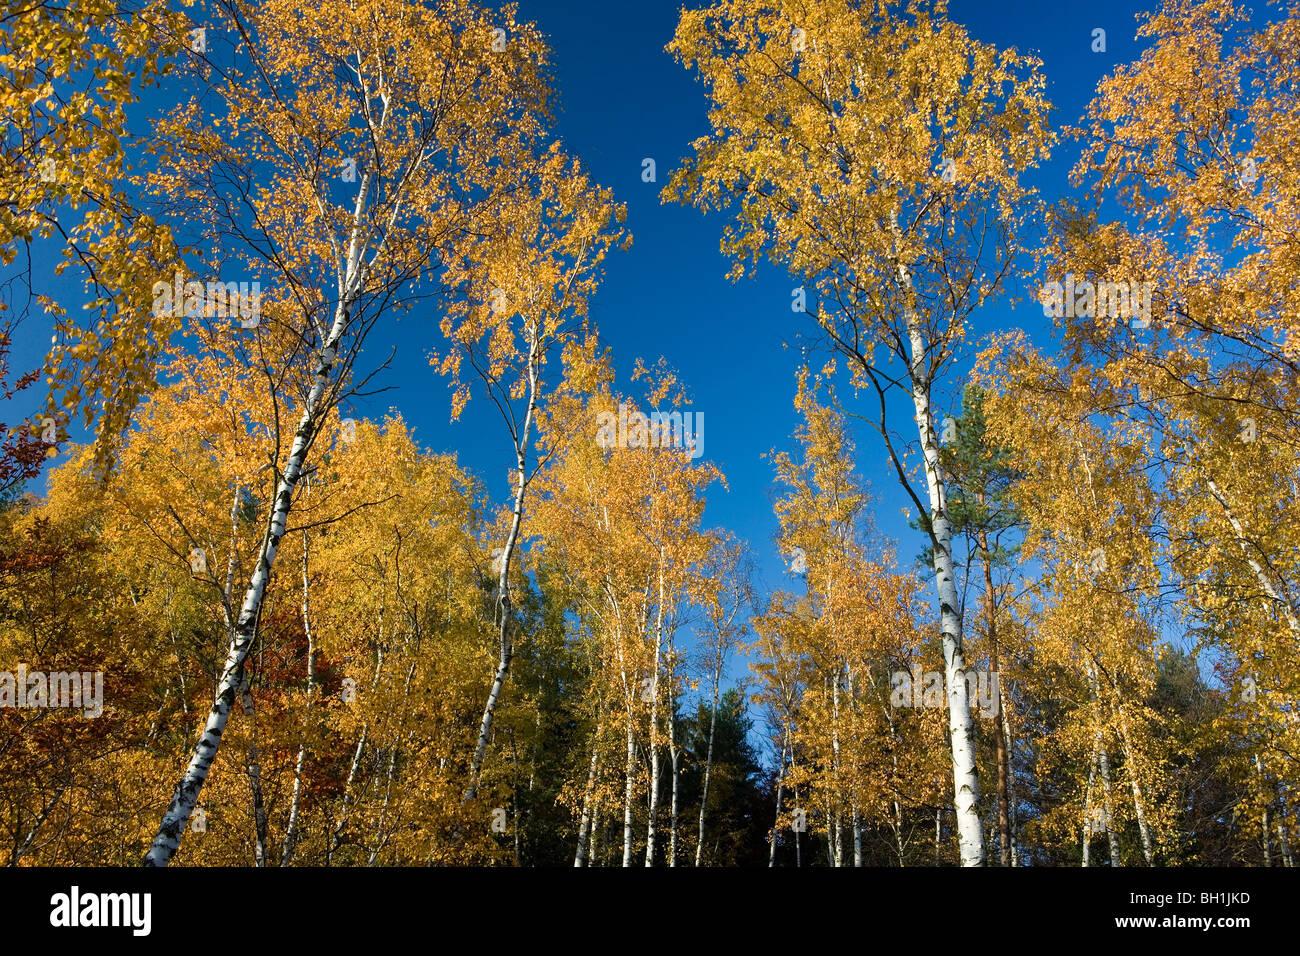 Autumnal birch trees in front of blue sky, Saxon Switzerland, Elbsandsteingebirge, Saxony, Germany, Europe - Stock Image